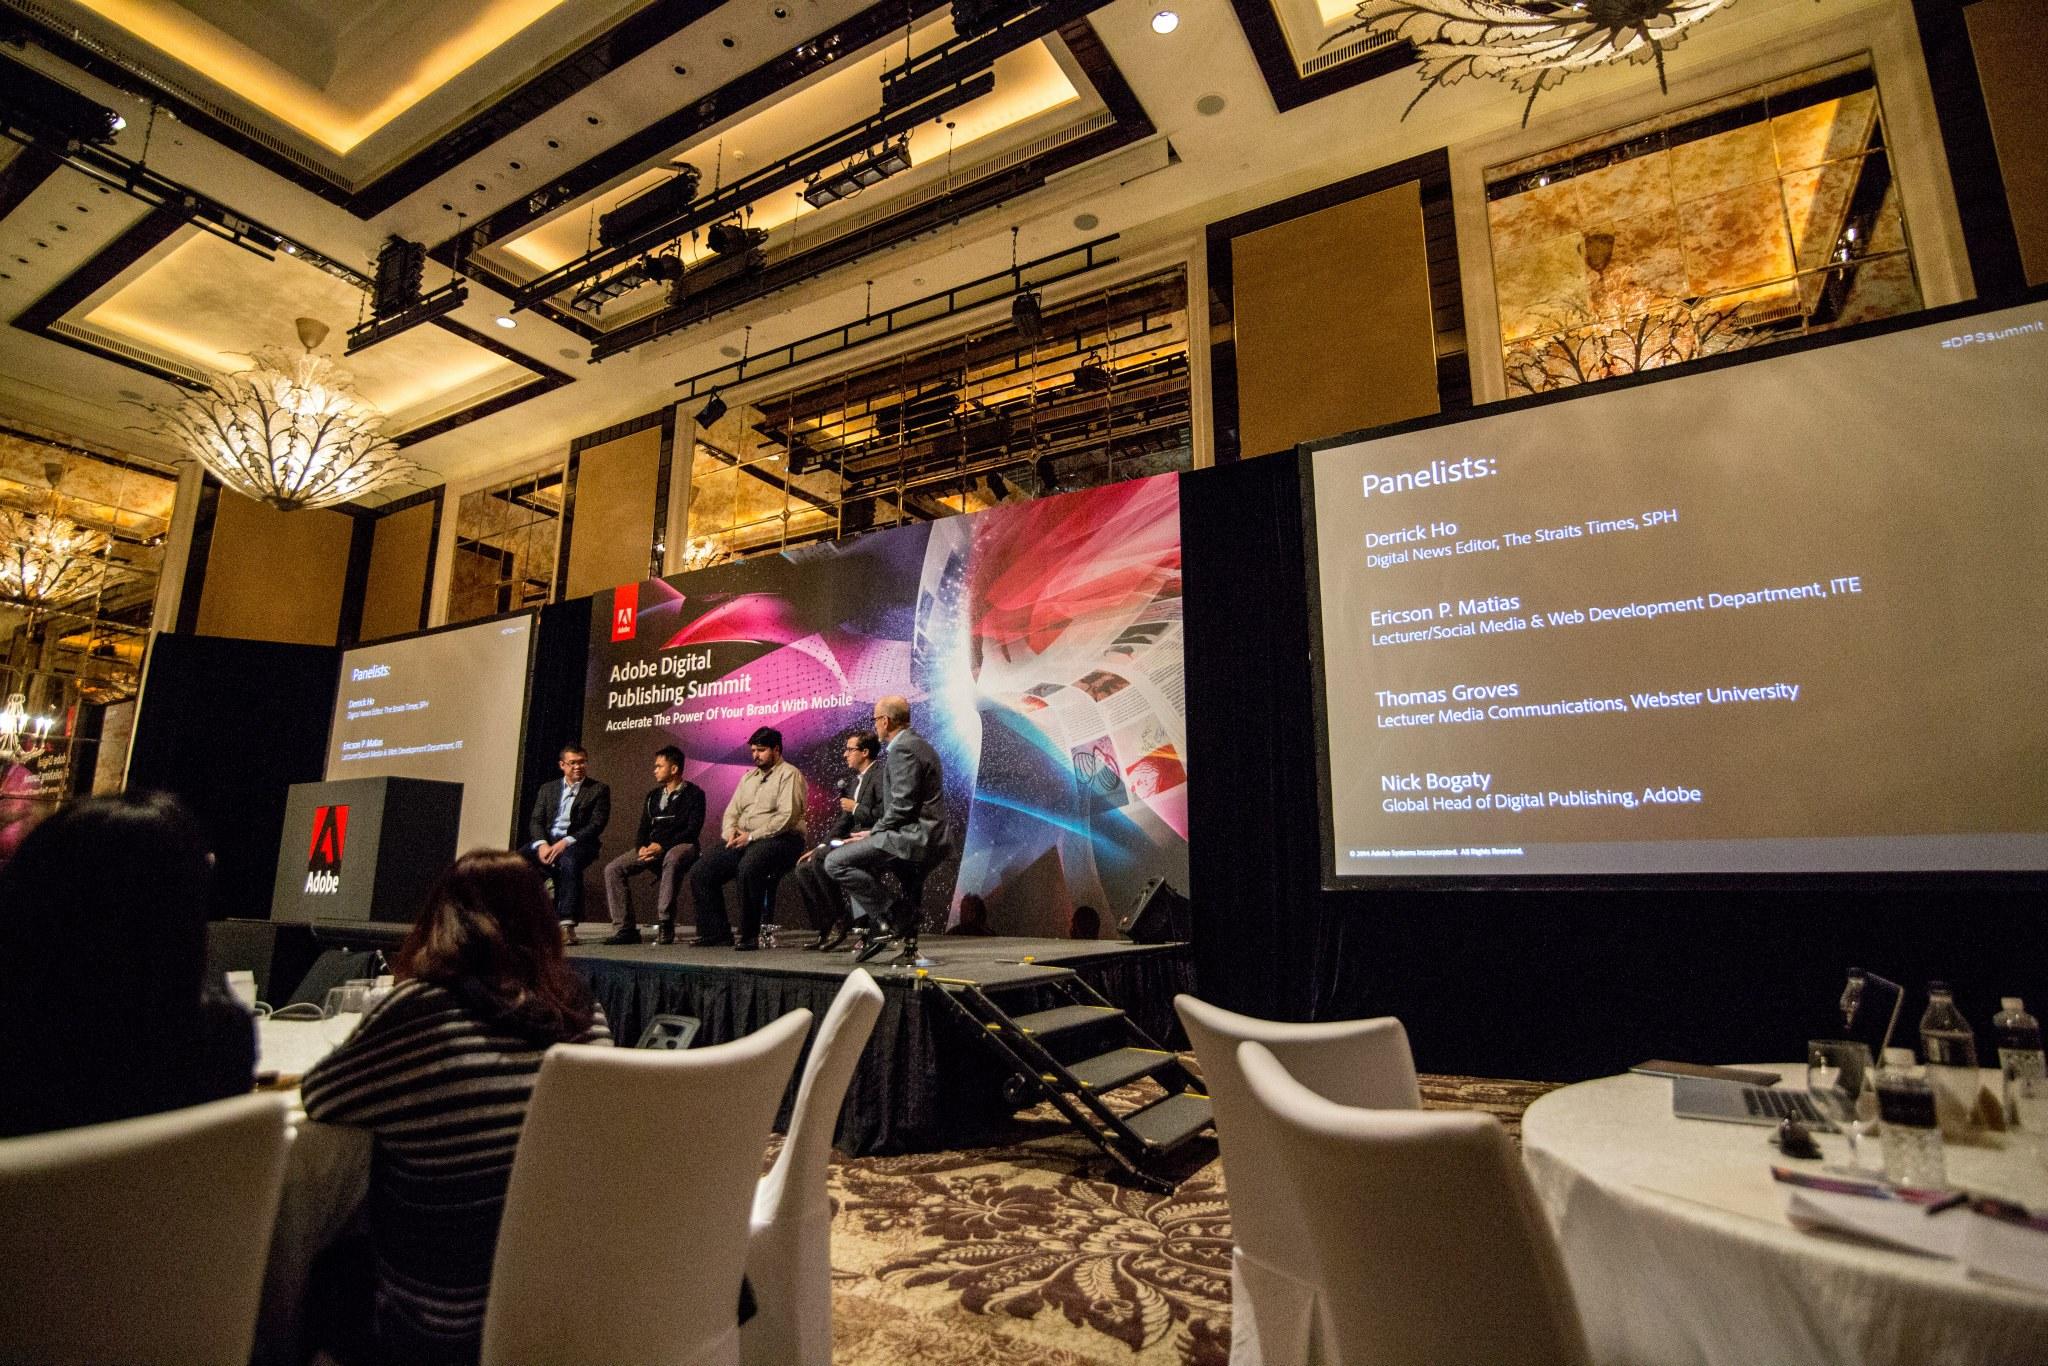 Adobe_DPS_Singapore-1.jpg